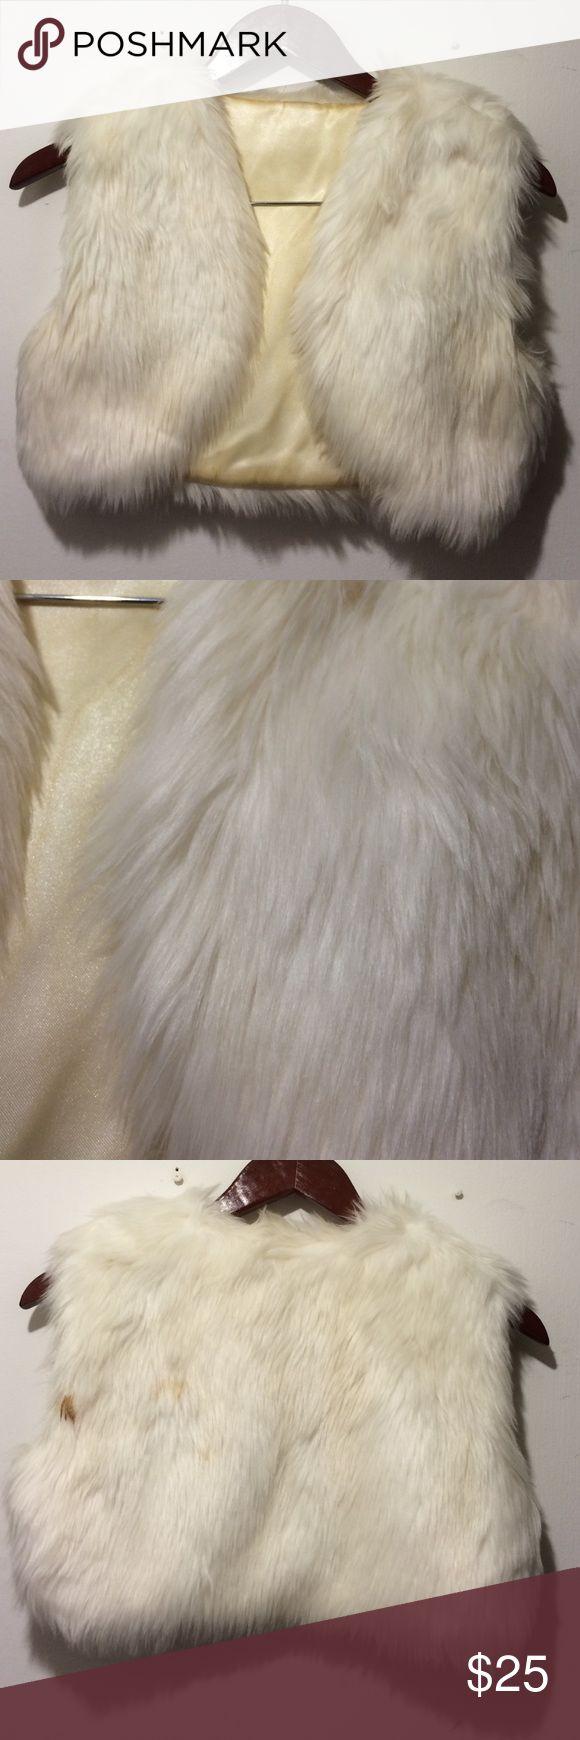 Faux fur bolero Faux fur cropped bolero in white. Fully lined, sleeveless. Stain at back left Jackets & Coats